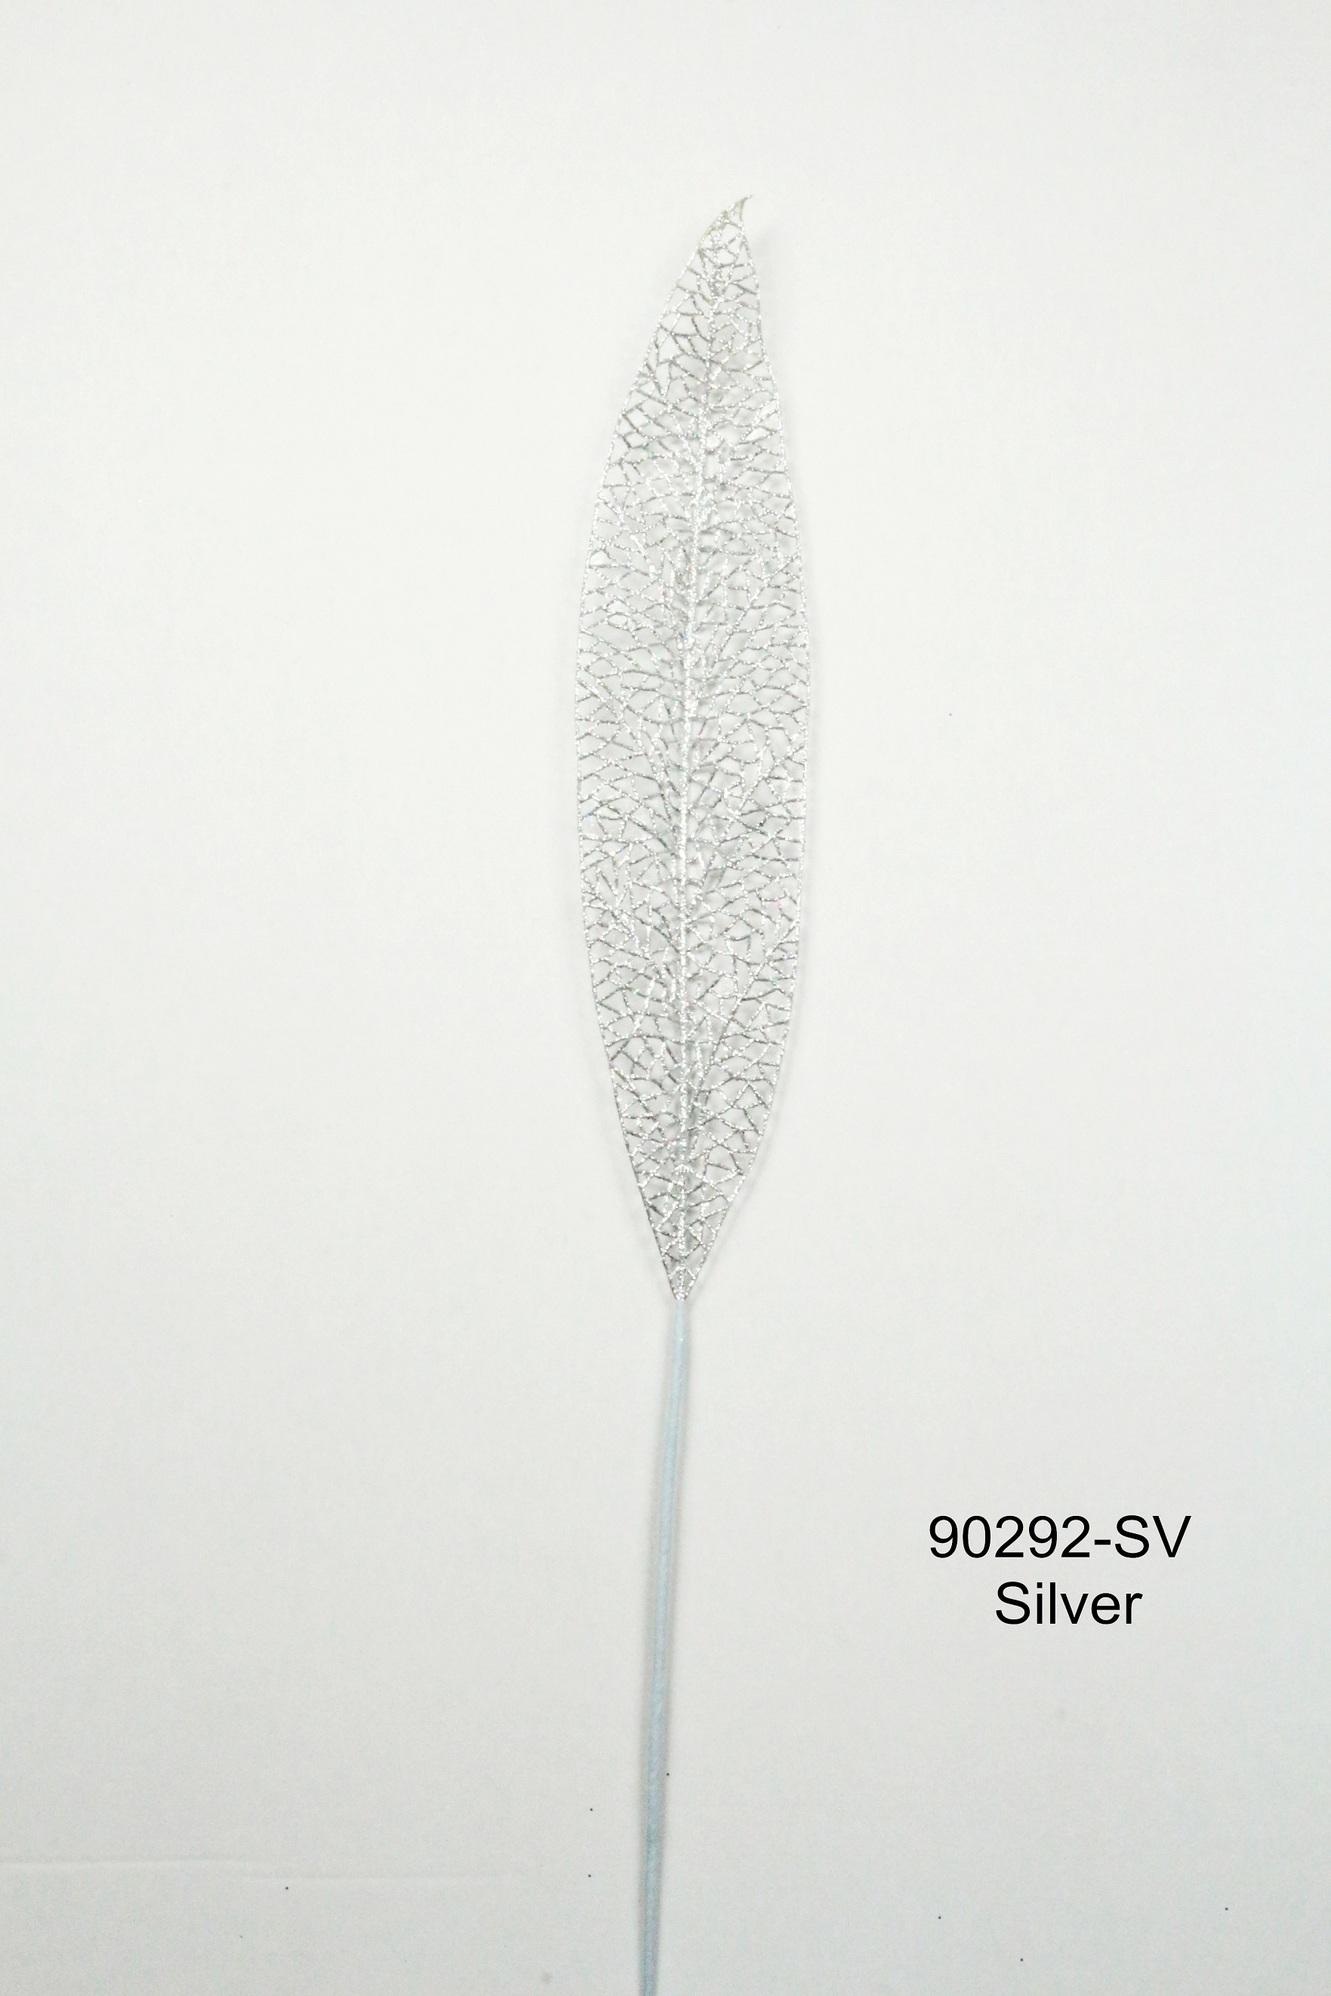 90292-SV